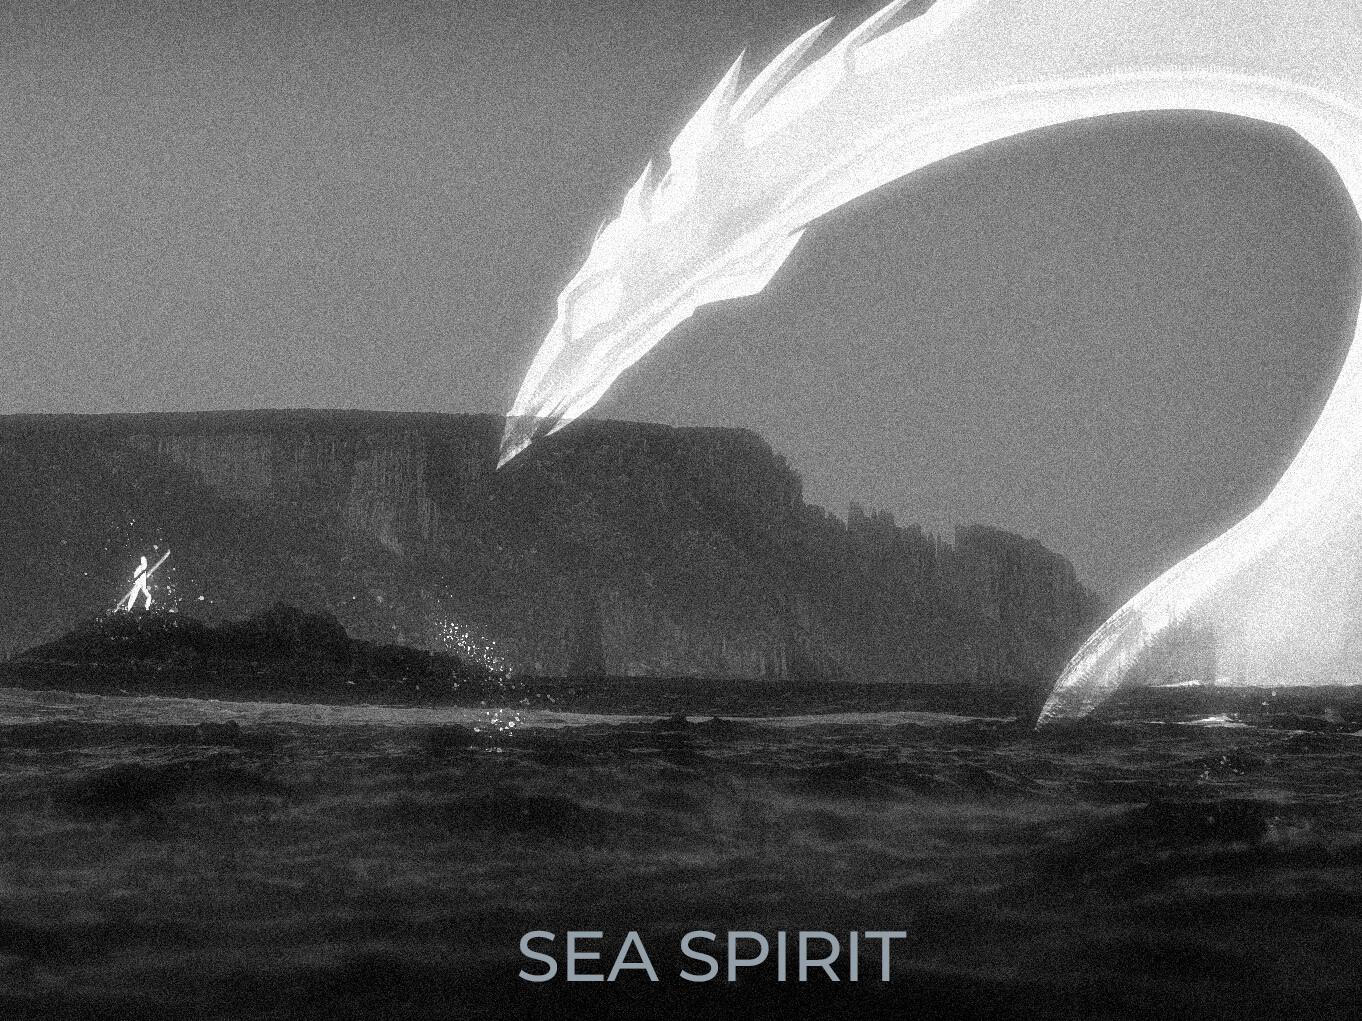 Sea Spirit [Gondor]